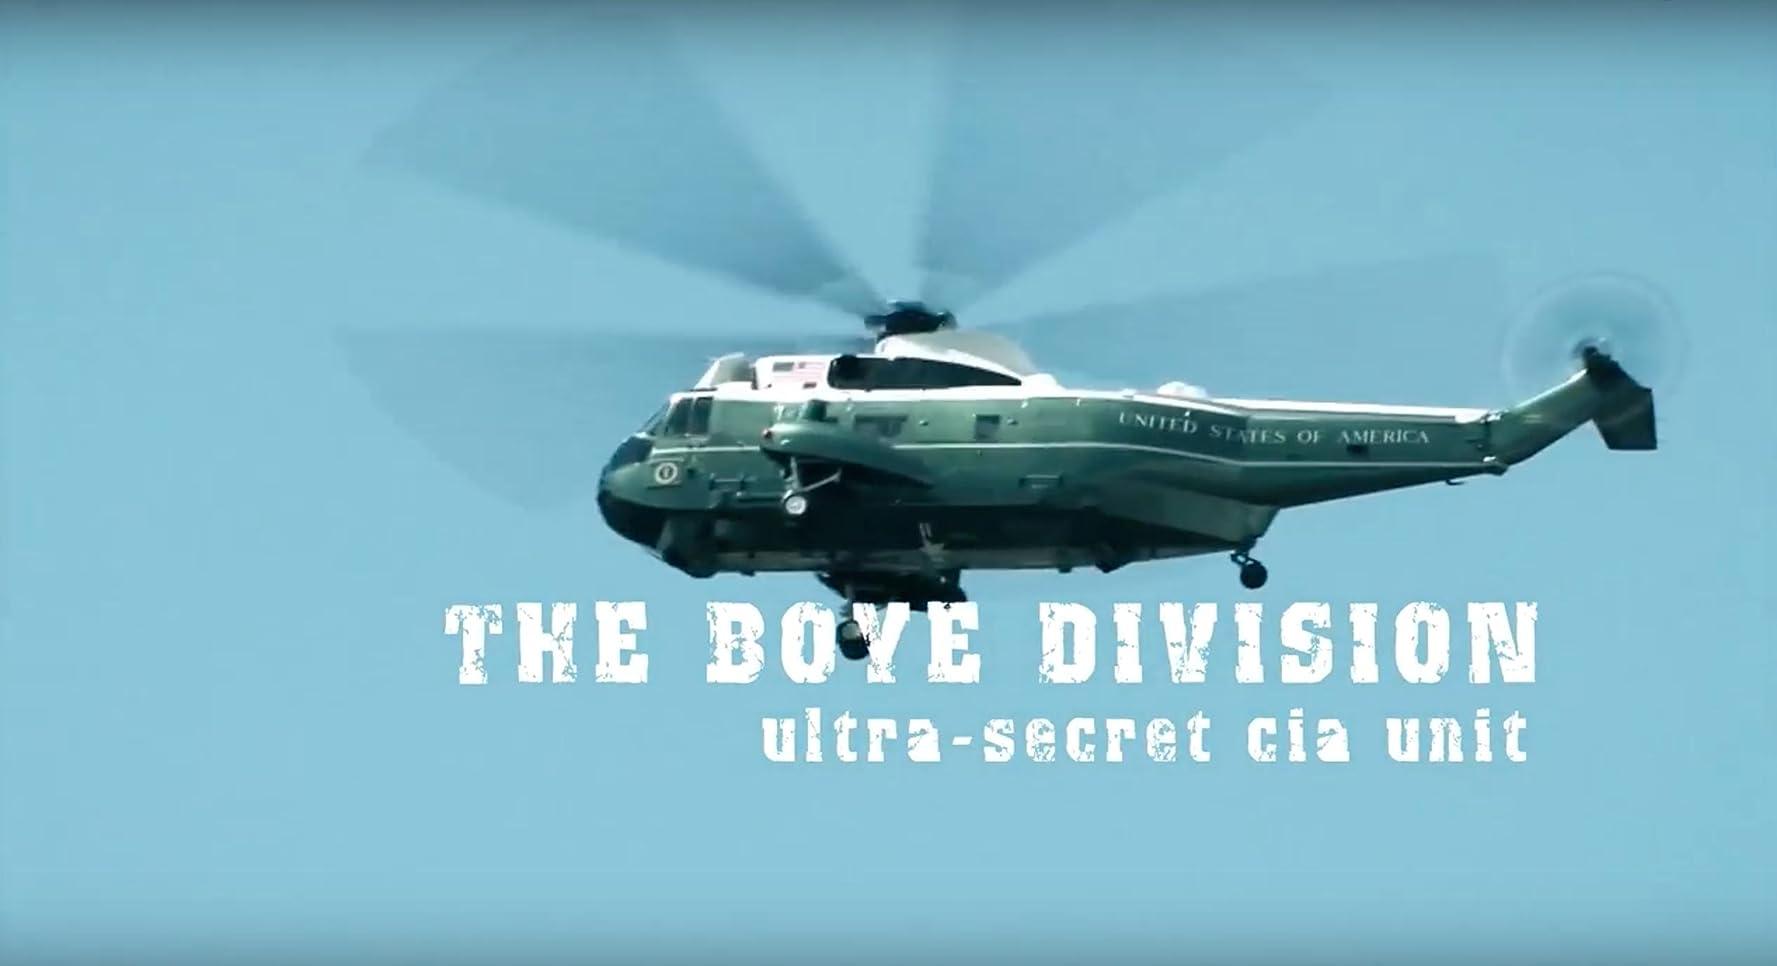 The BOYE Division (2014)